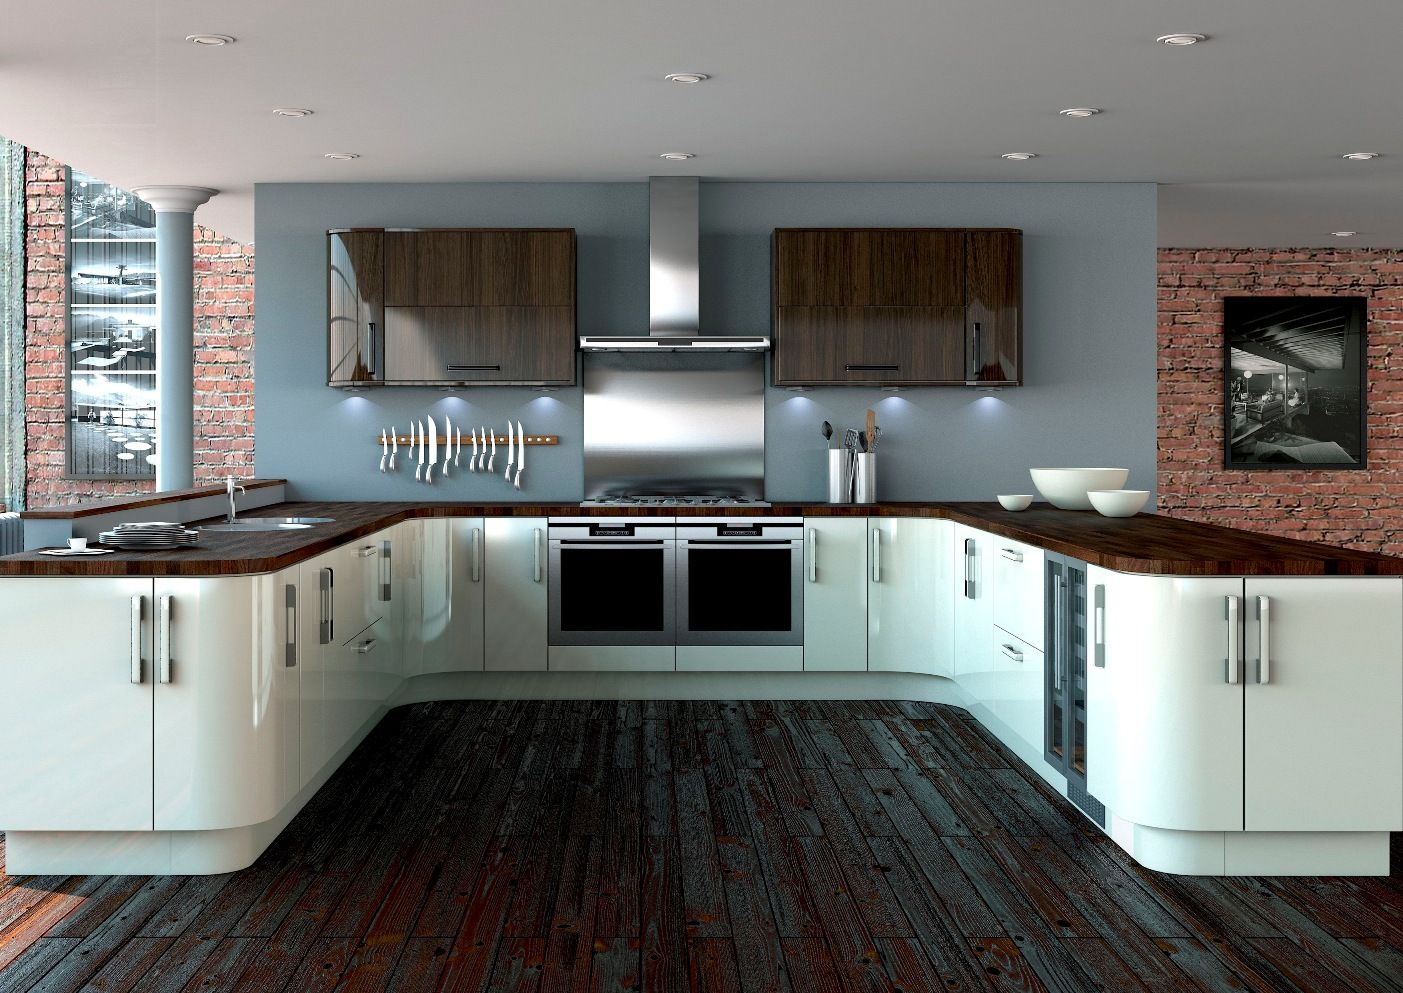 Modern Kitchen Styles Leekes Kitchens Kitchen Styling Modern Contemporary Kitchen Inspiration Kitchen Fittings